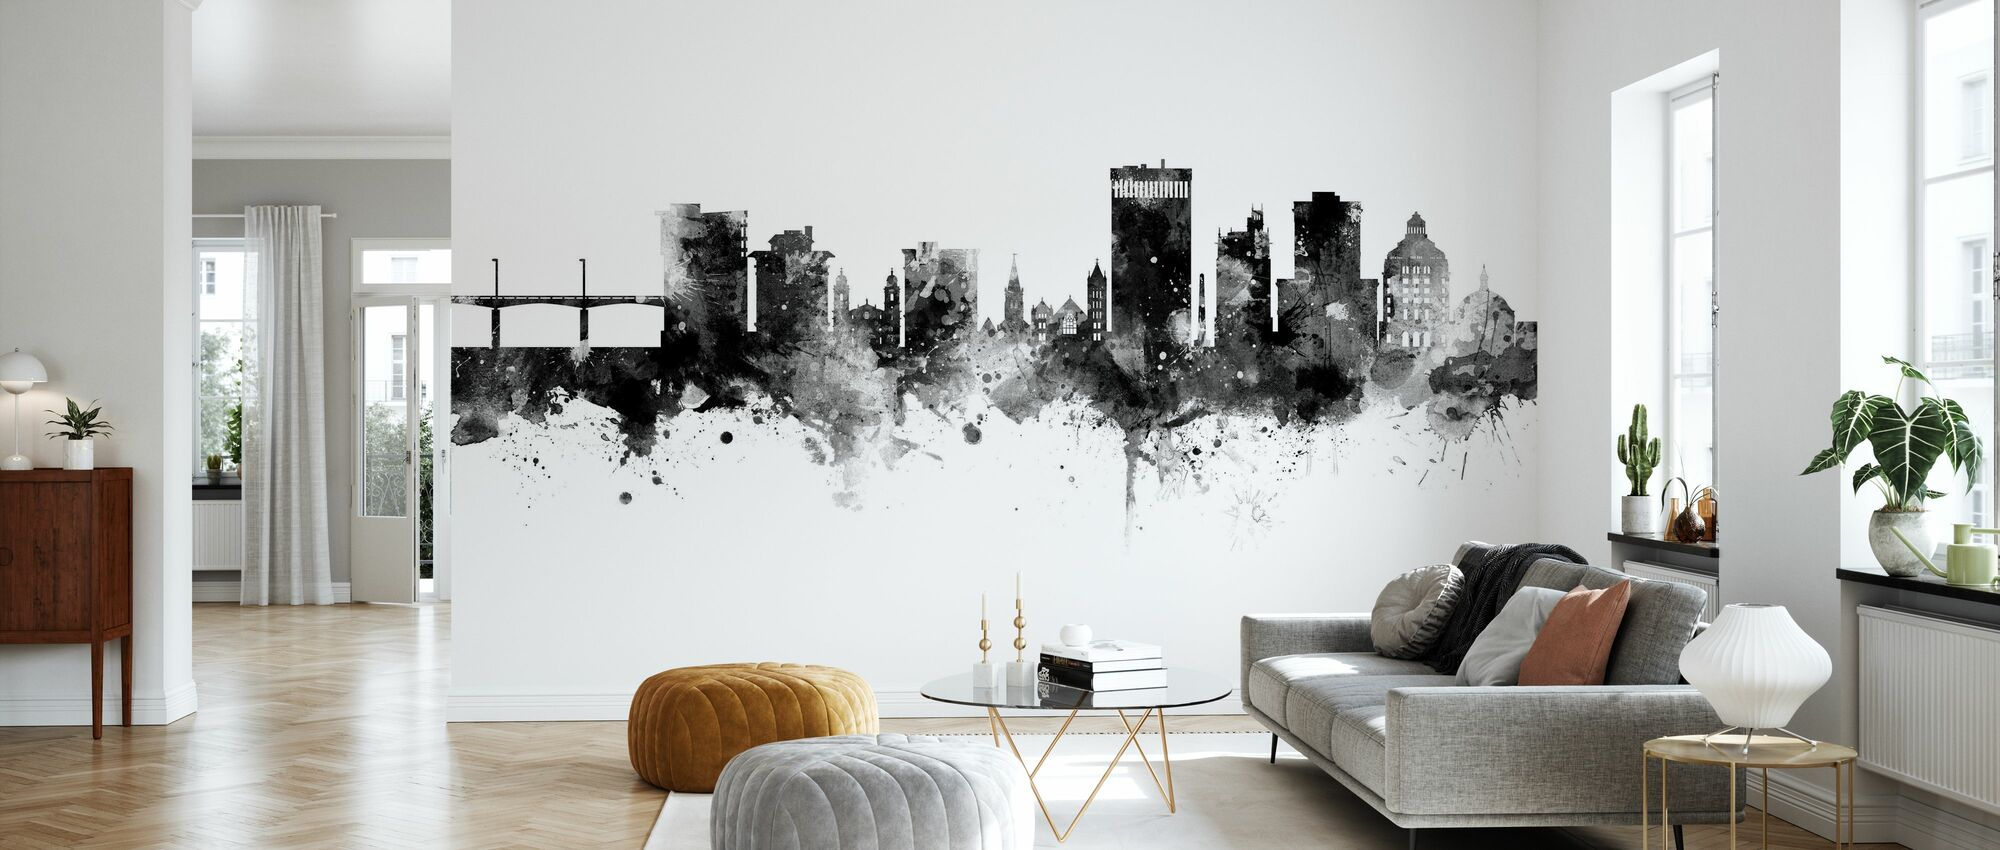 Asheville North Carolina Skyline - Wallpaper - Living Room